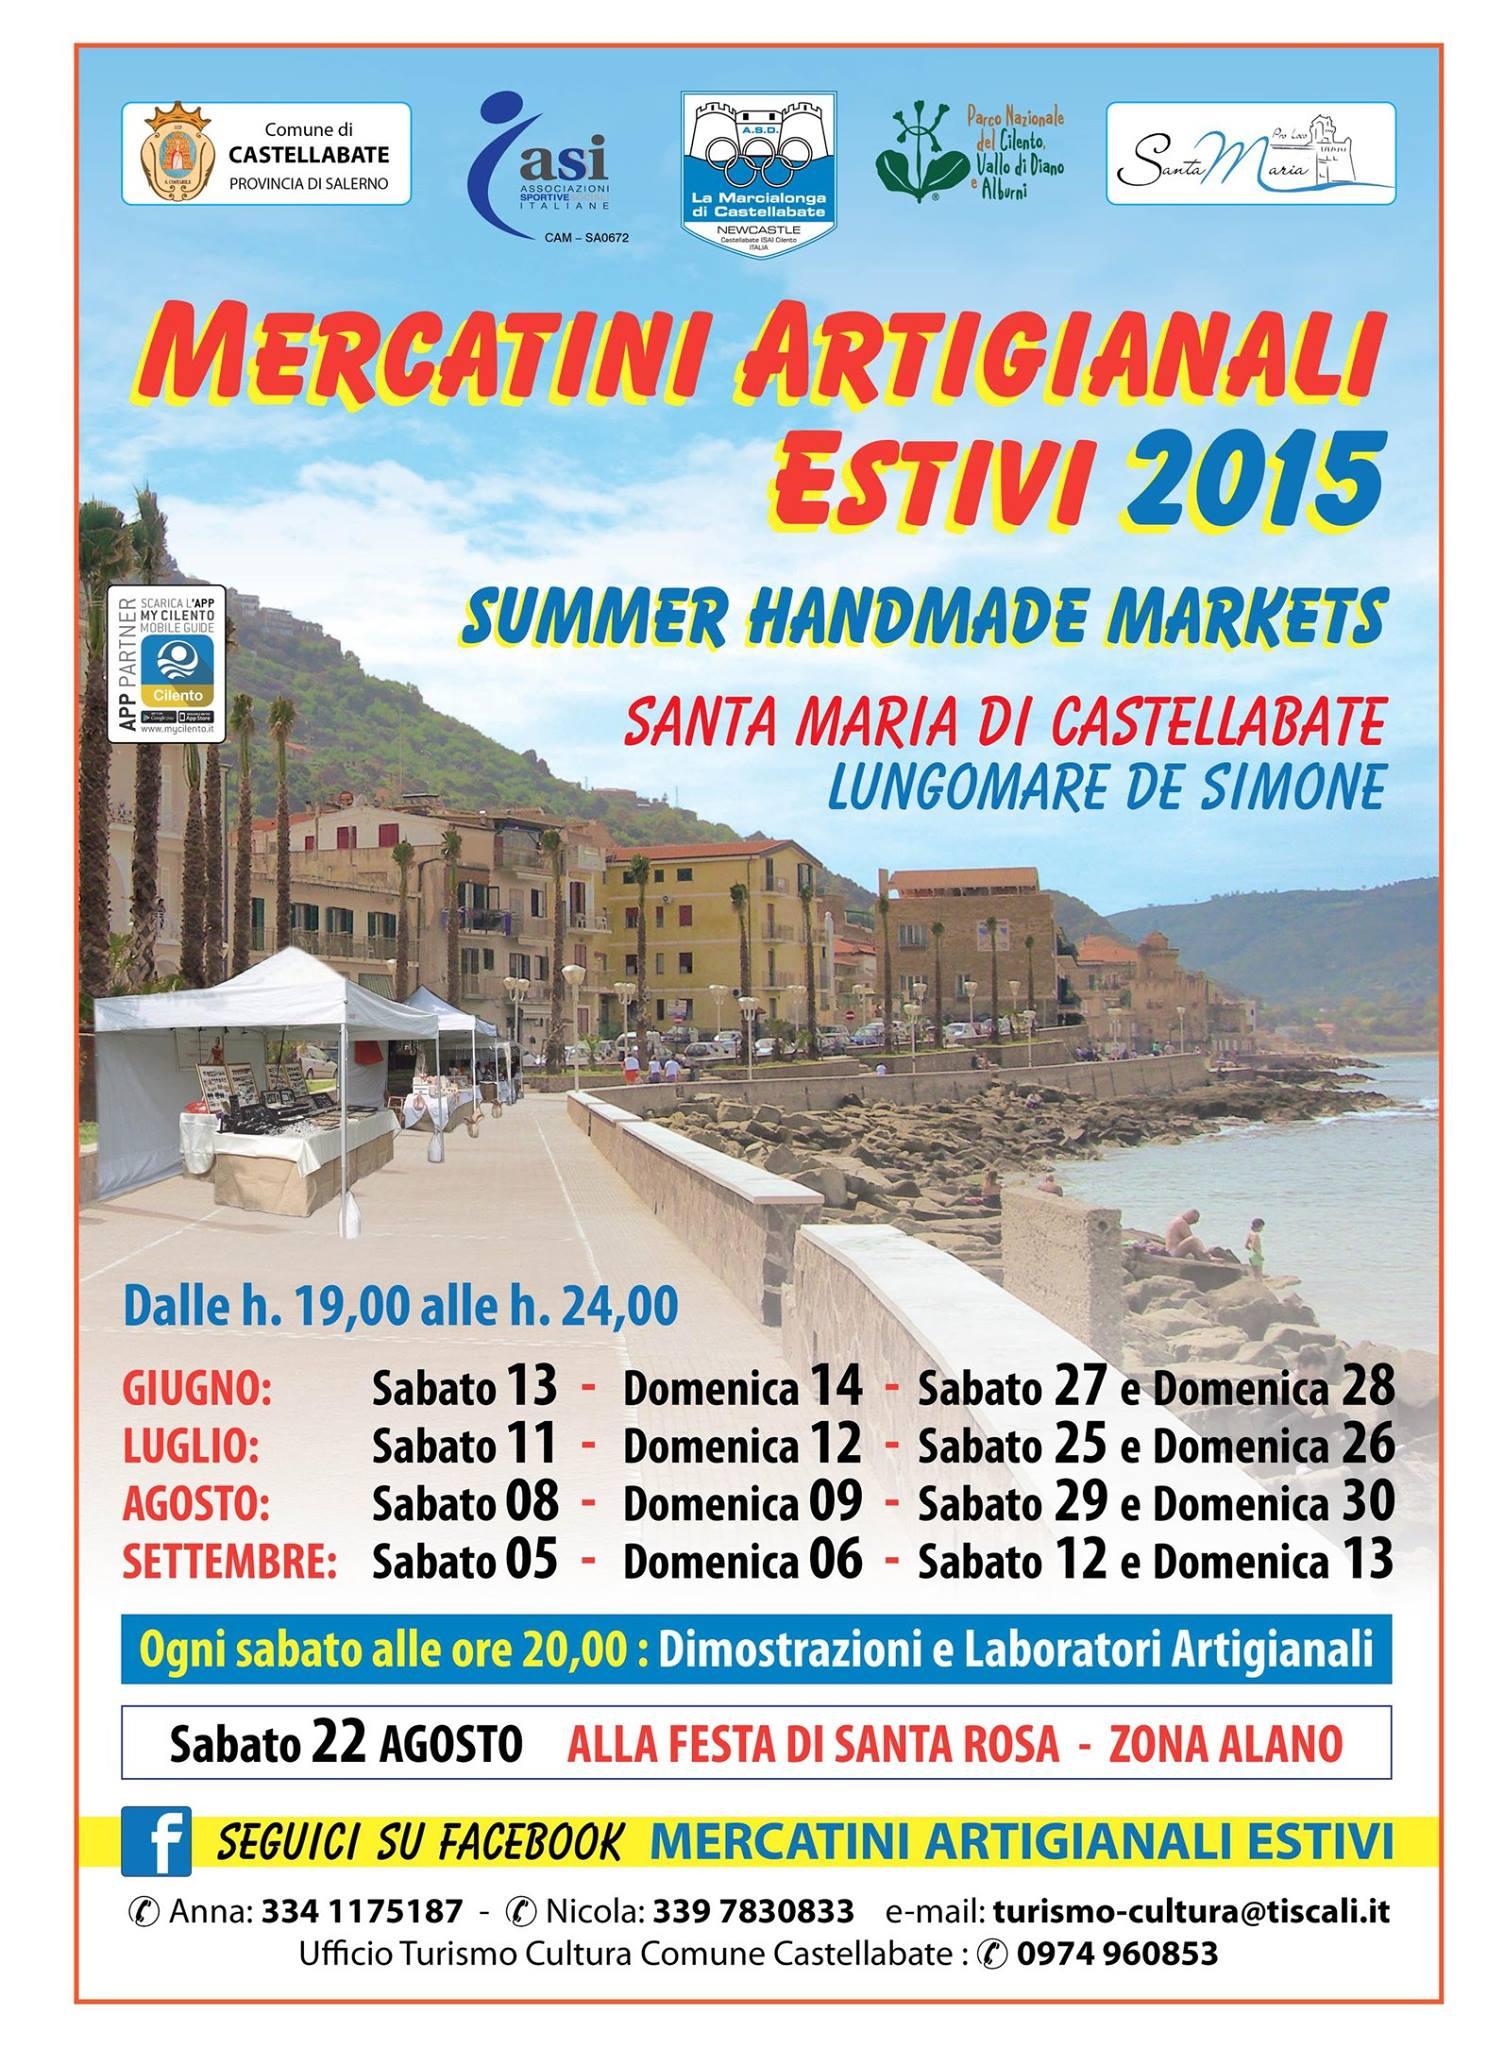 mercatini artigianali estivi 2015